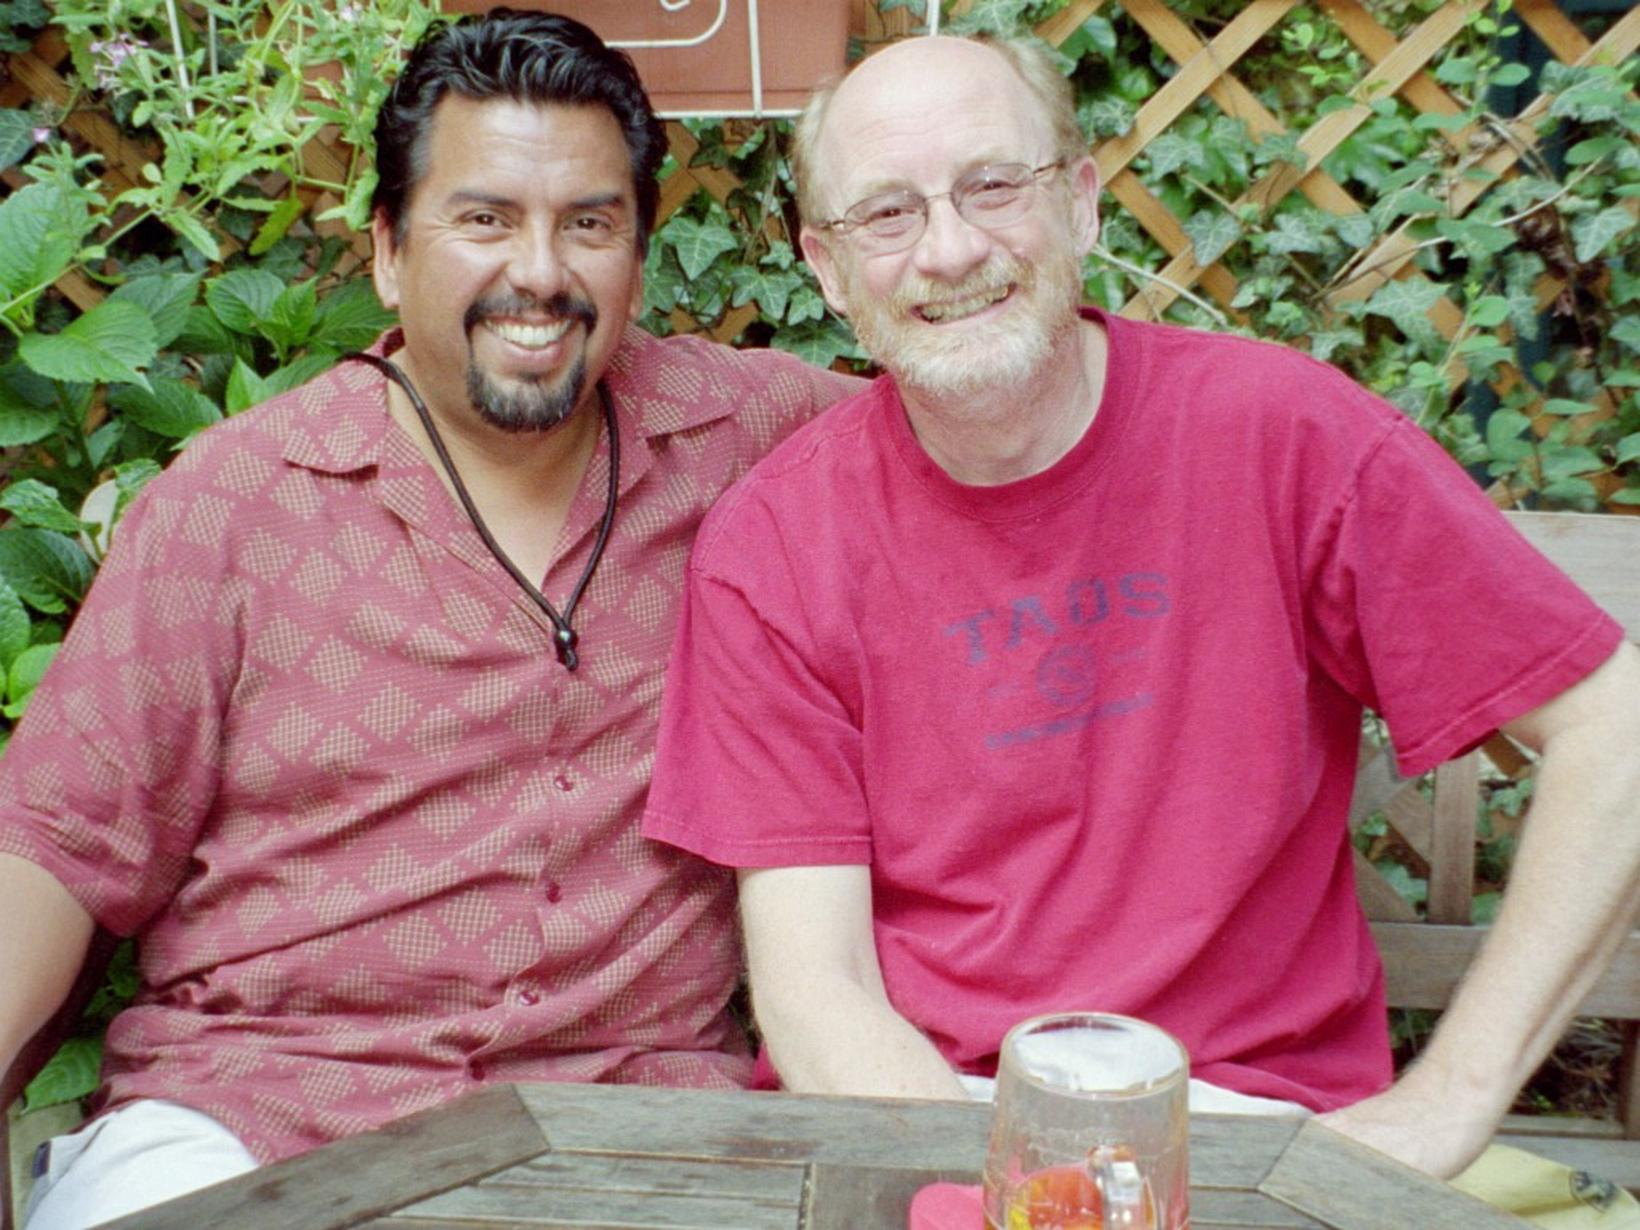 John & John from Santa Cruz, California, United States